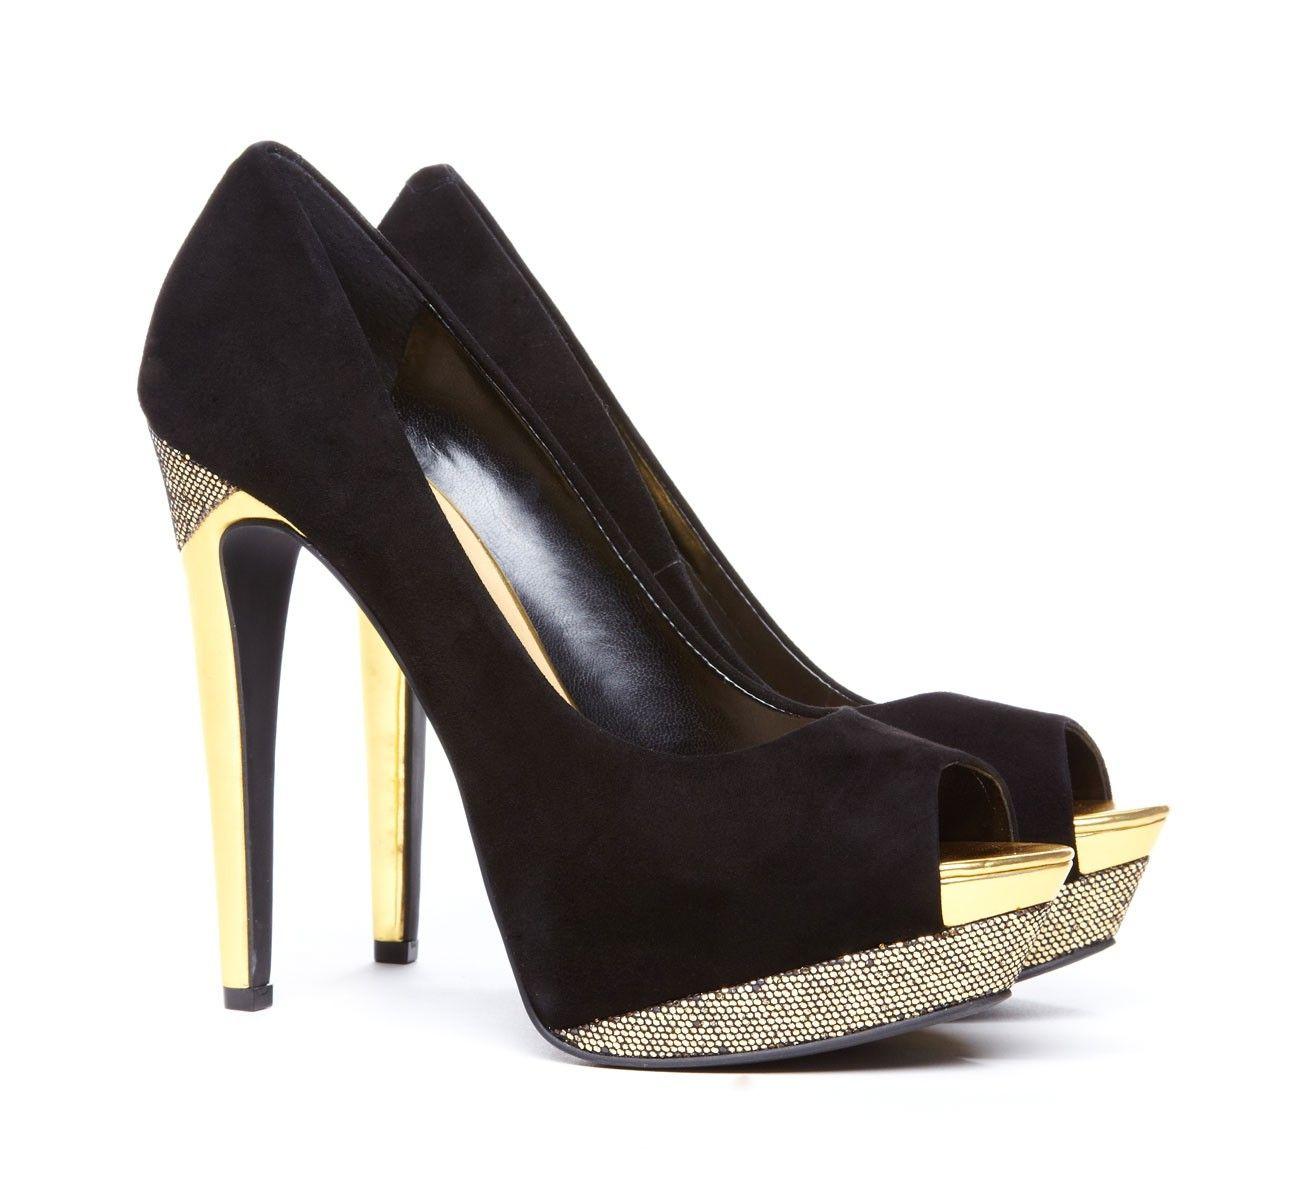 metallic peep toes